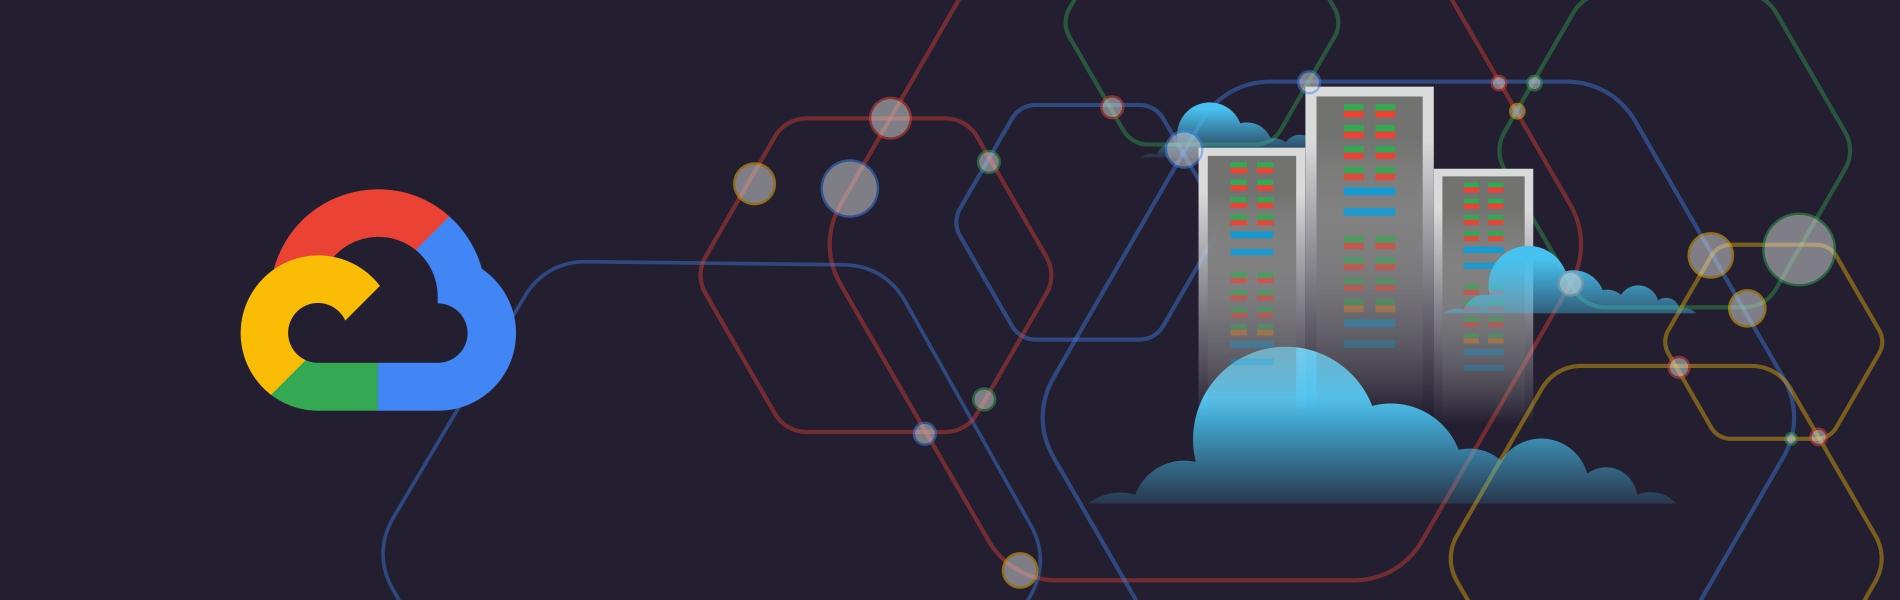 Blog-Header-Virtual-Data-Centre-in-Google-Cloud-Platform-1900x600